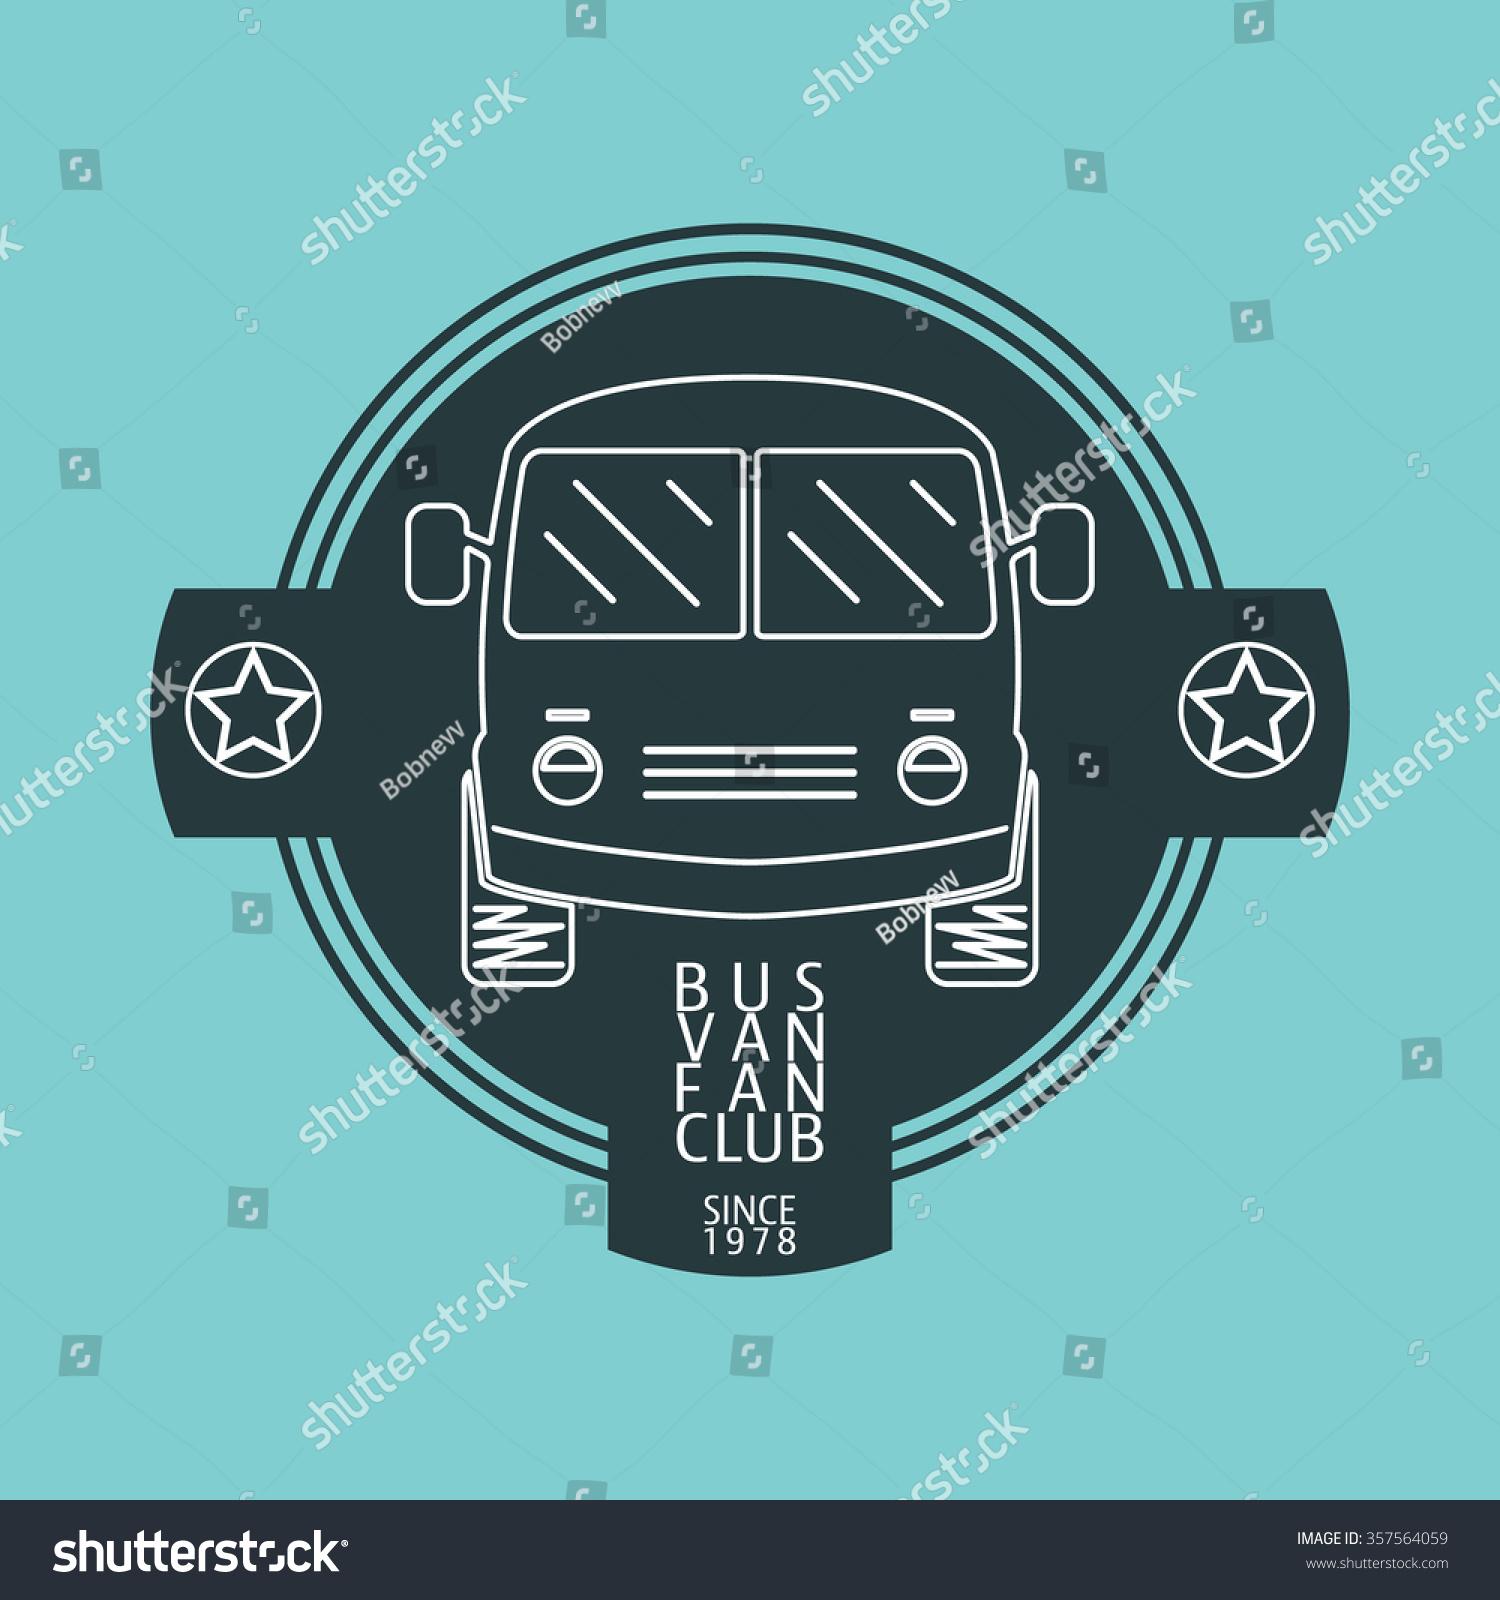 Design car club logo - Bus Van Fan Club Logo Template Vintage Bus For Insignia Labels Emblems